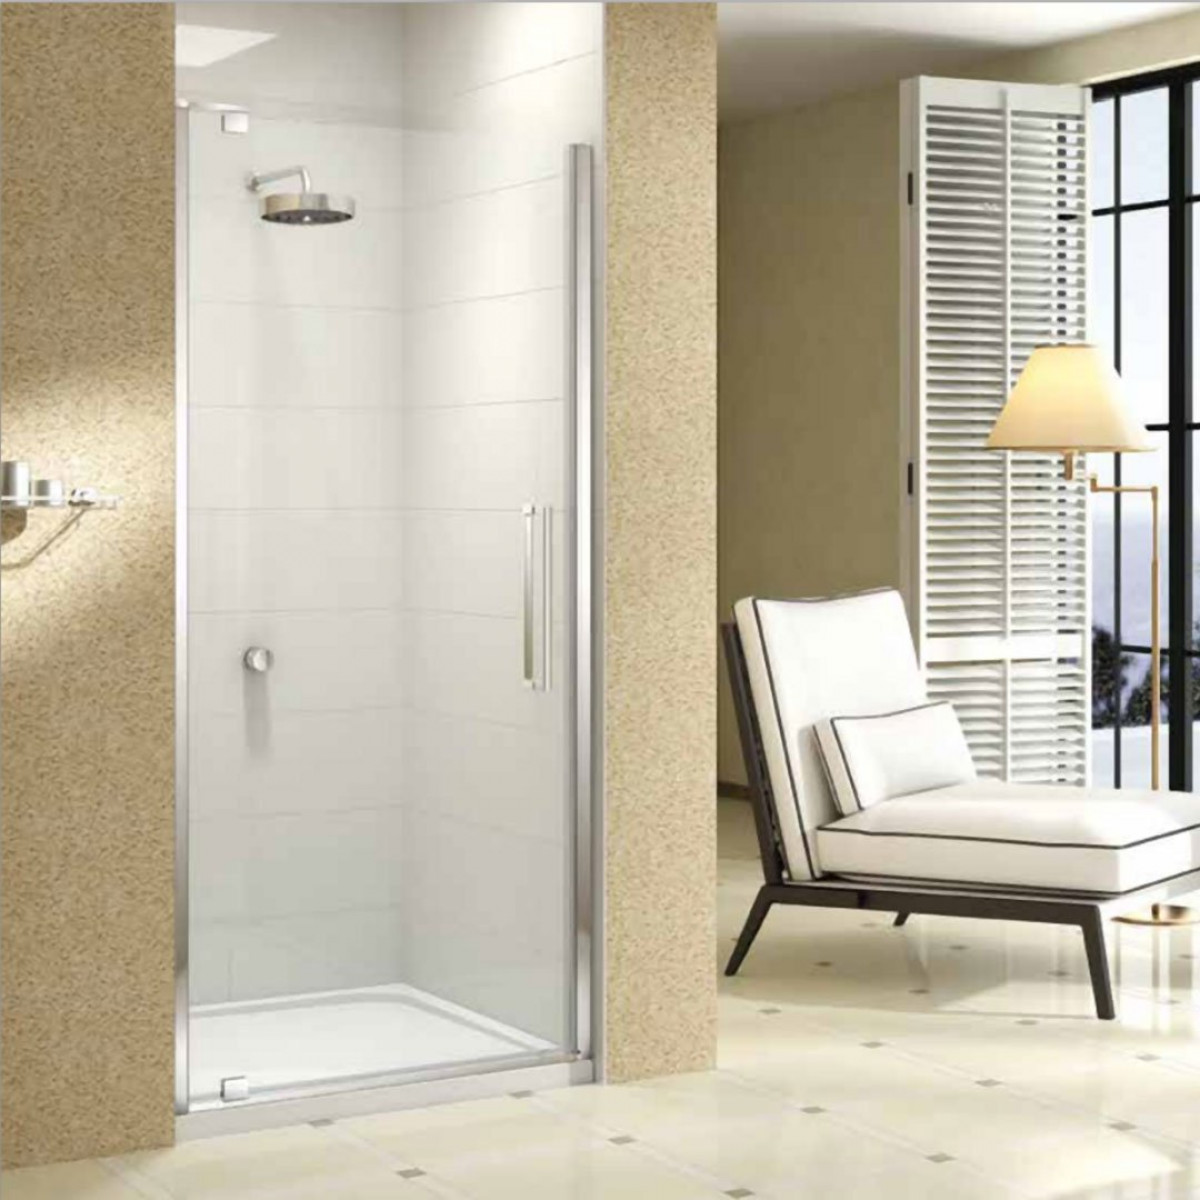 Merlyn 10 Series 900mm Pivot Shower Door M101221c